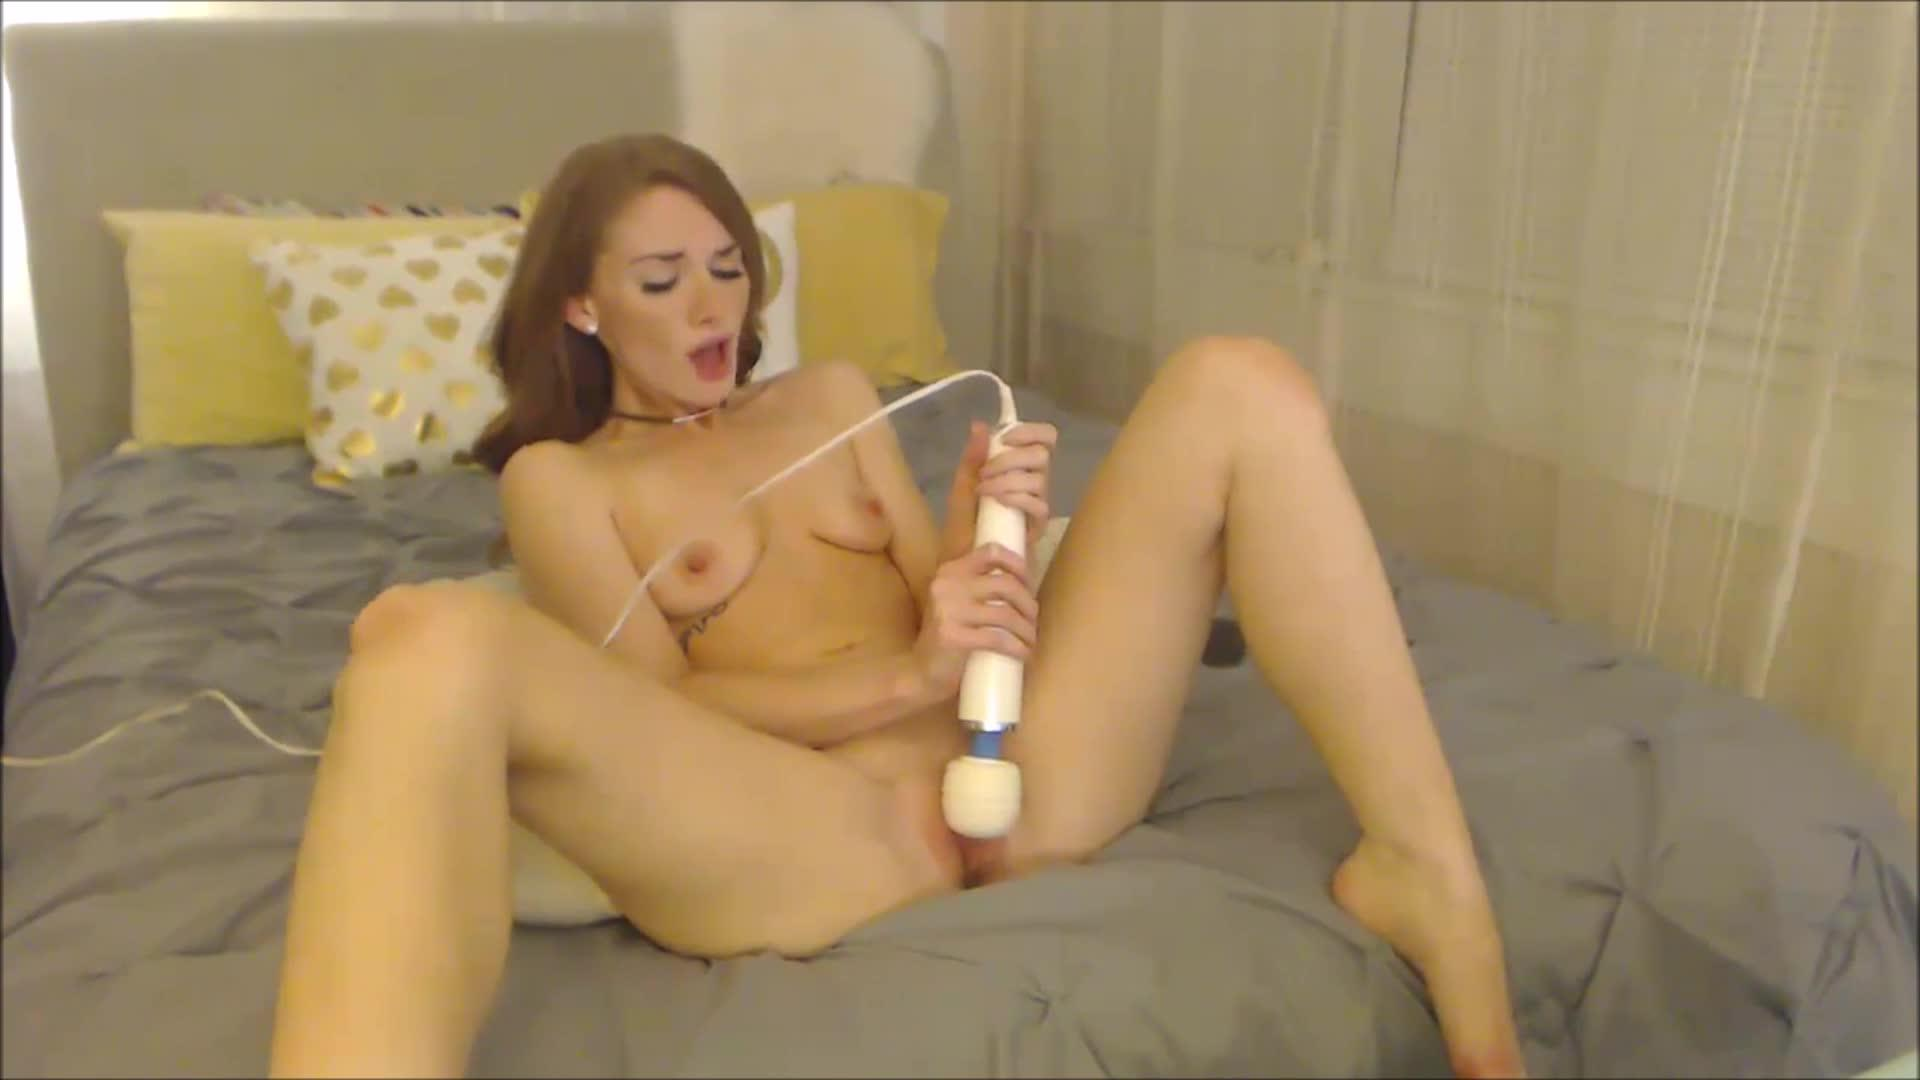 8 inches cock hitachi cock massage with condom cum filling 7